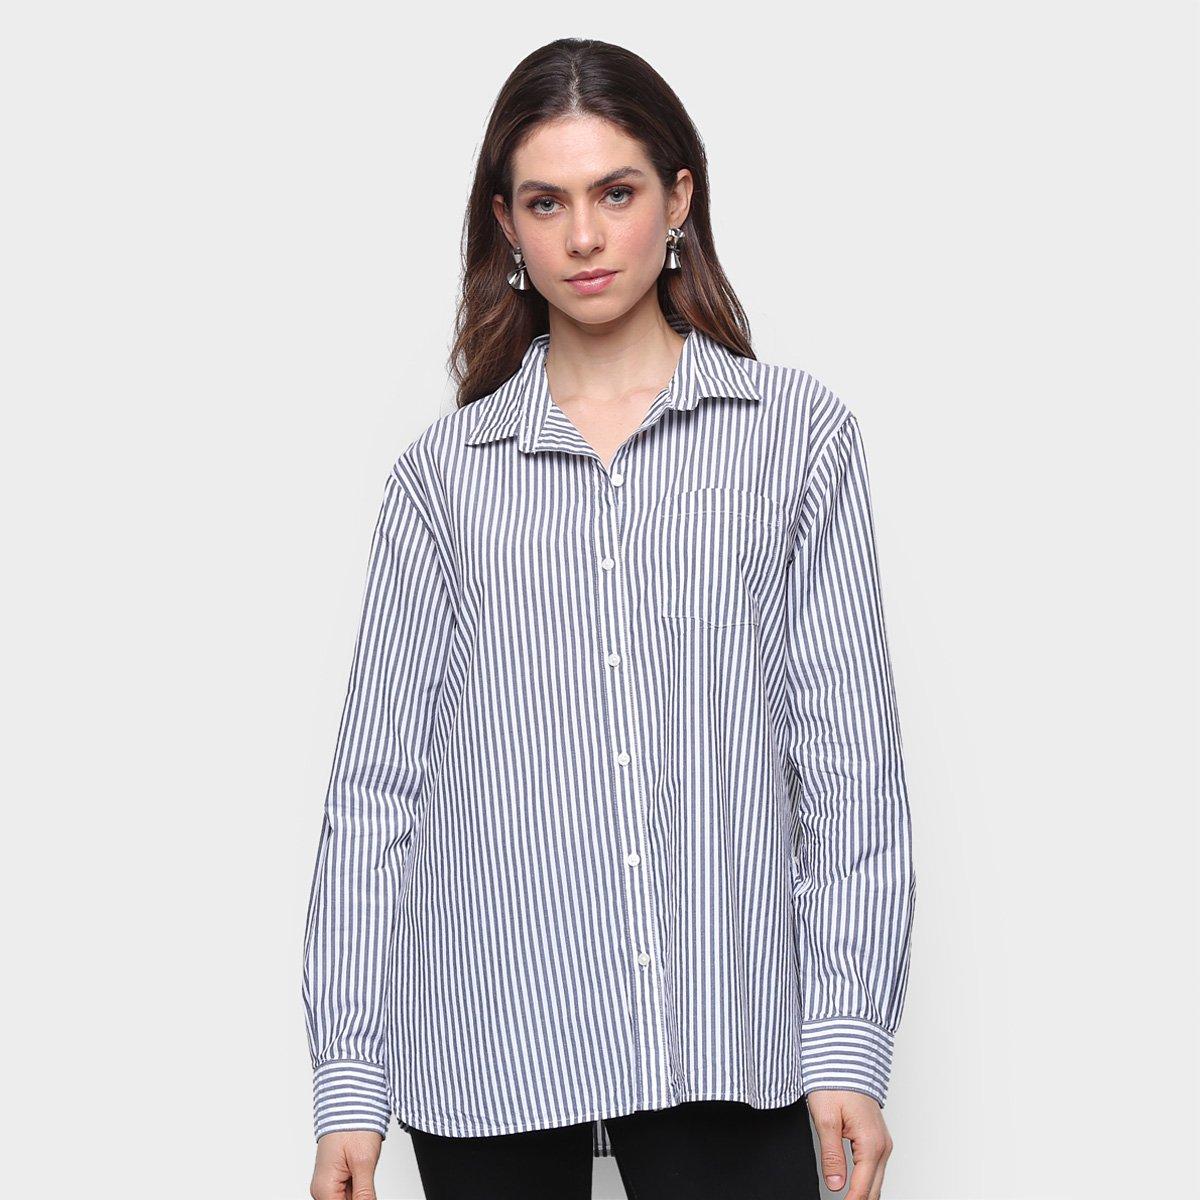 Camisa Manga Longa GAP Listras Feminina